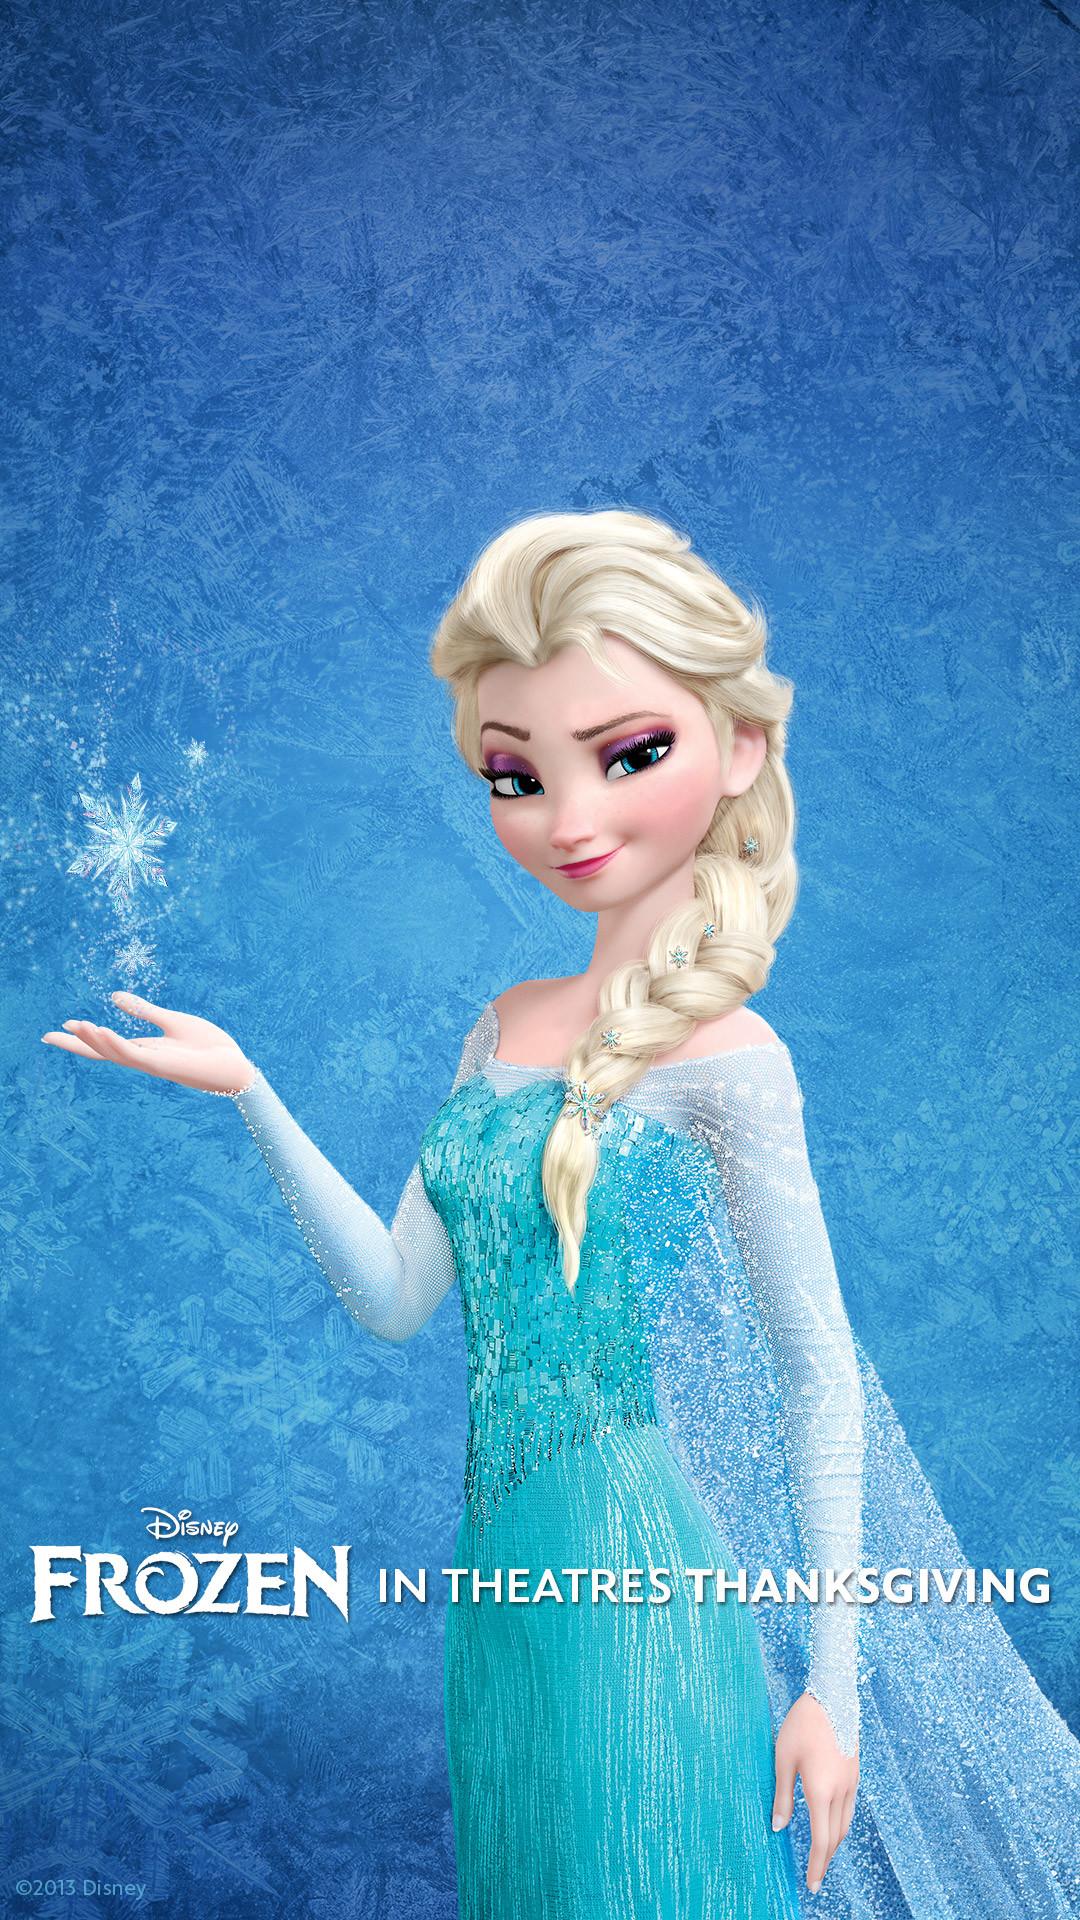 Elsa Frozen Wallpaper Phone (71+ images)